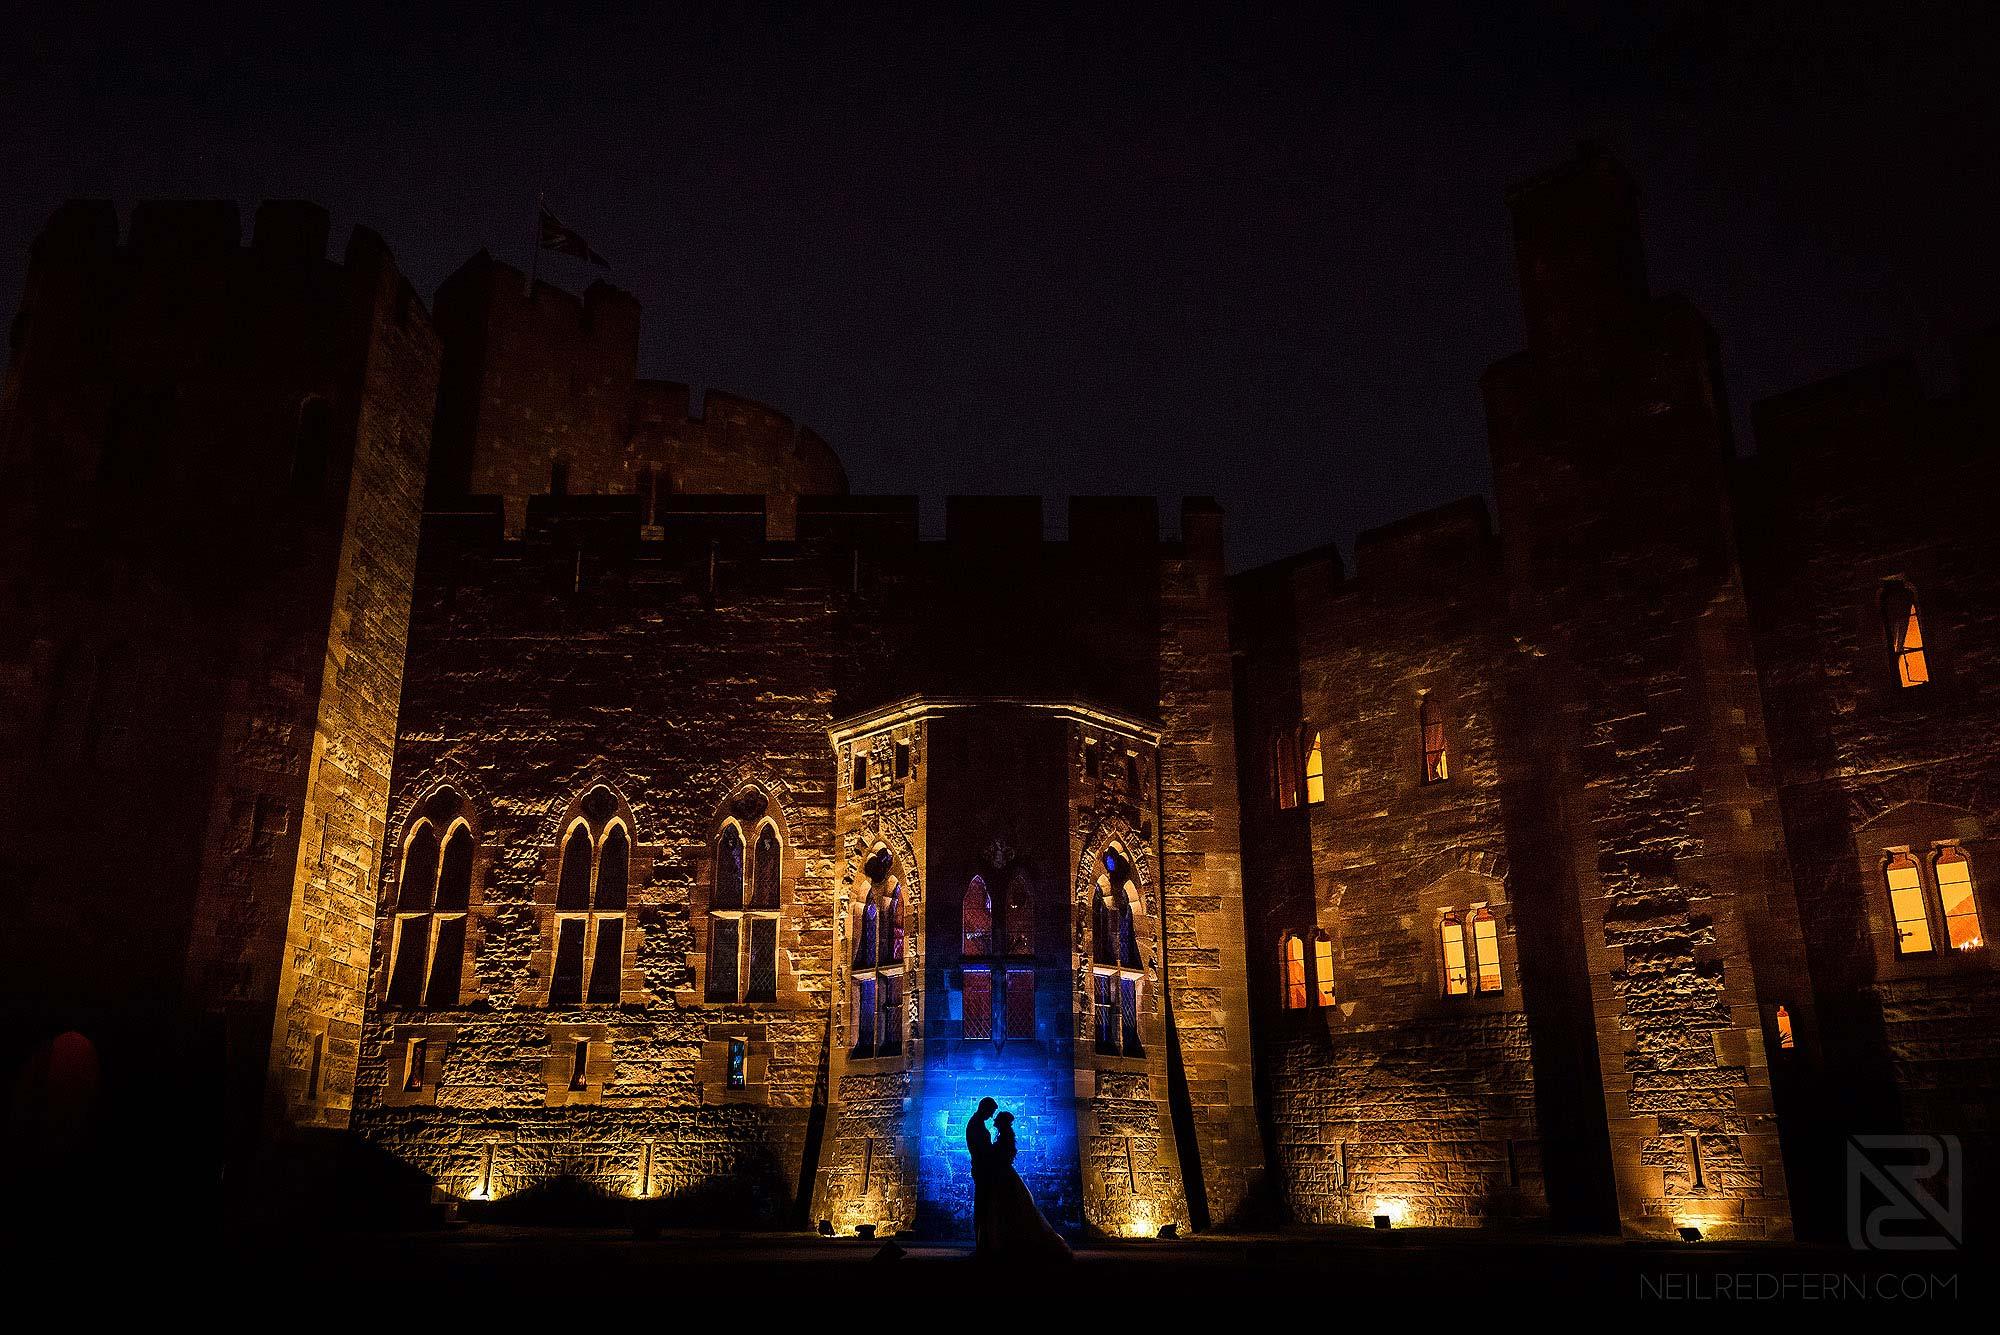 OCF wedding portrait at night at Peckforton Castle